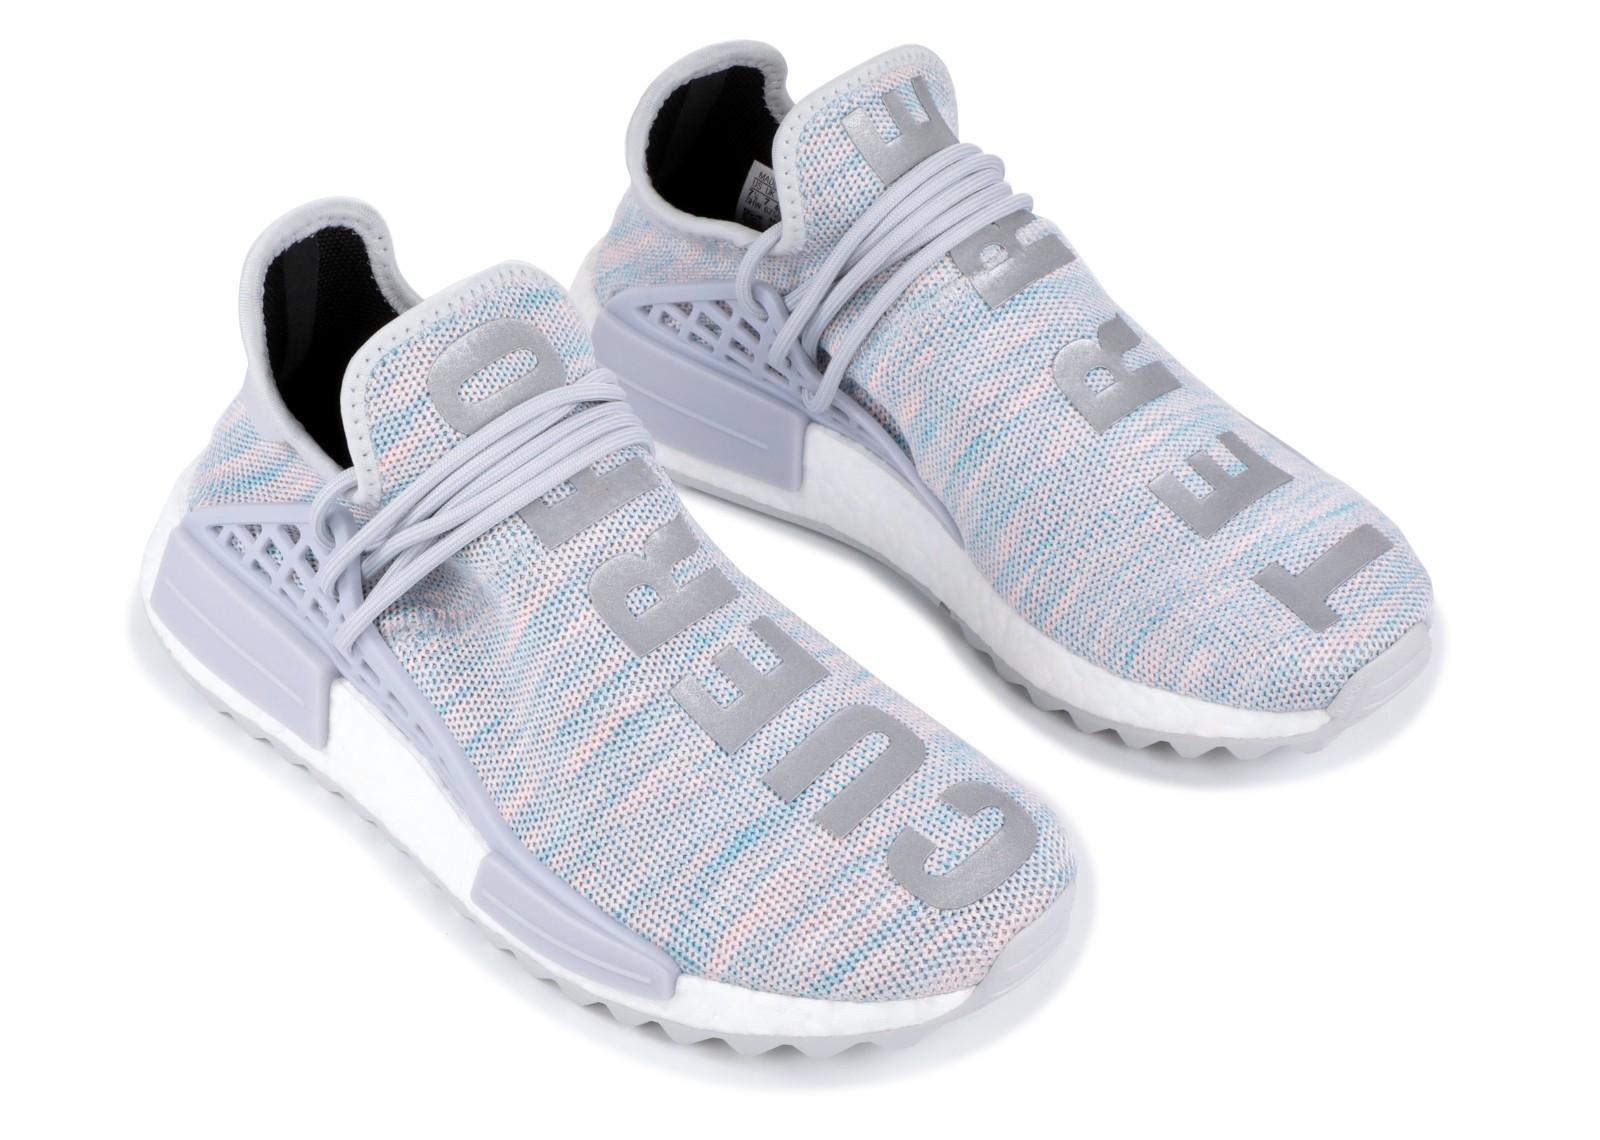 on sale 56b19 dbdc9 Kick Avenue - Authentic Sneakers